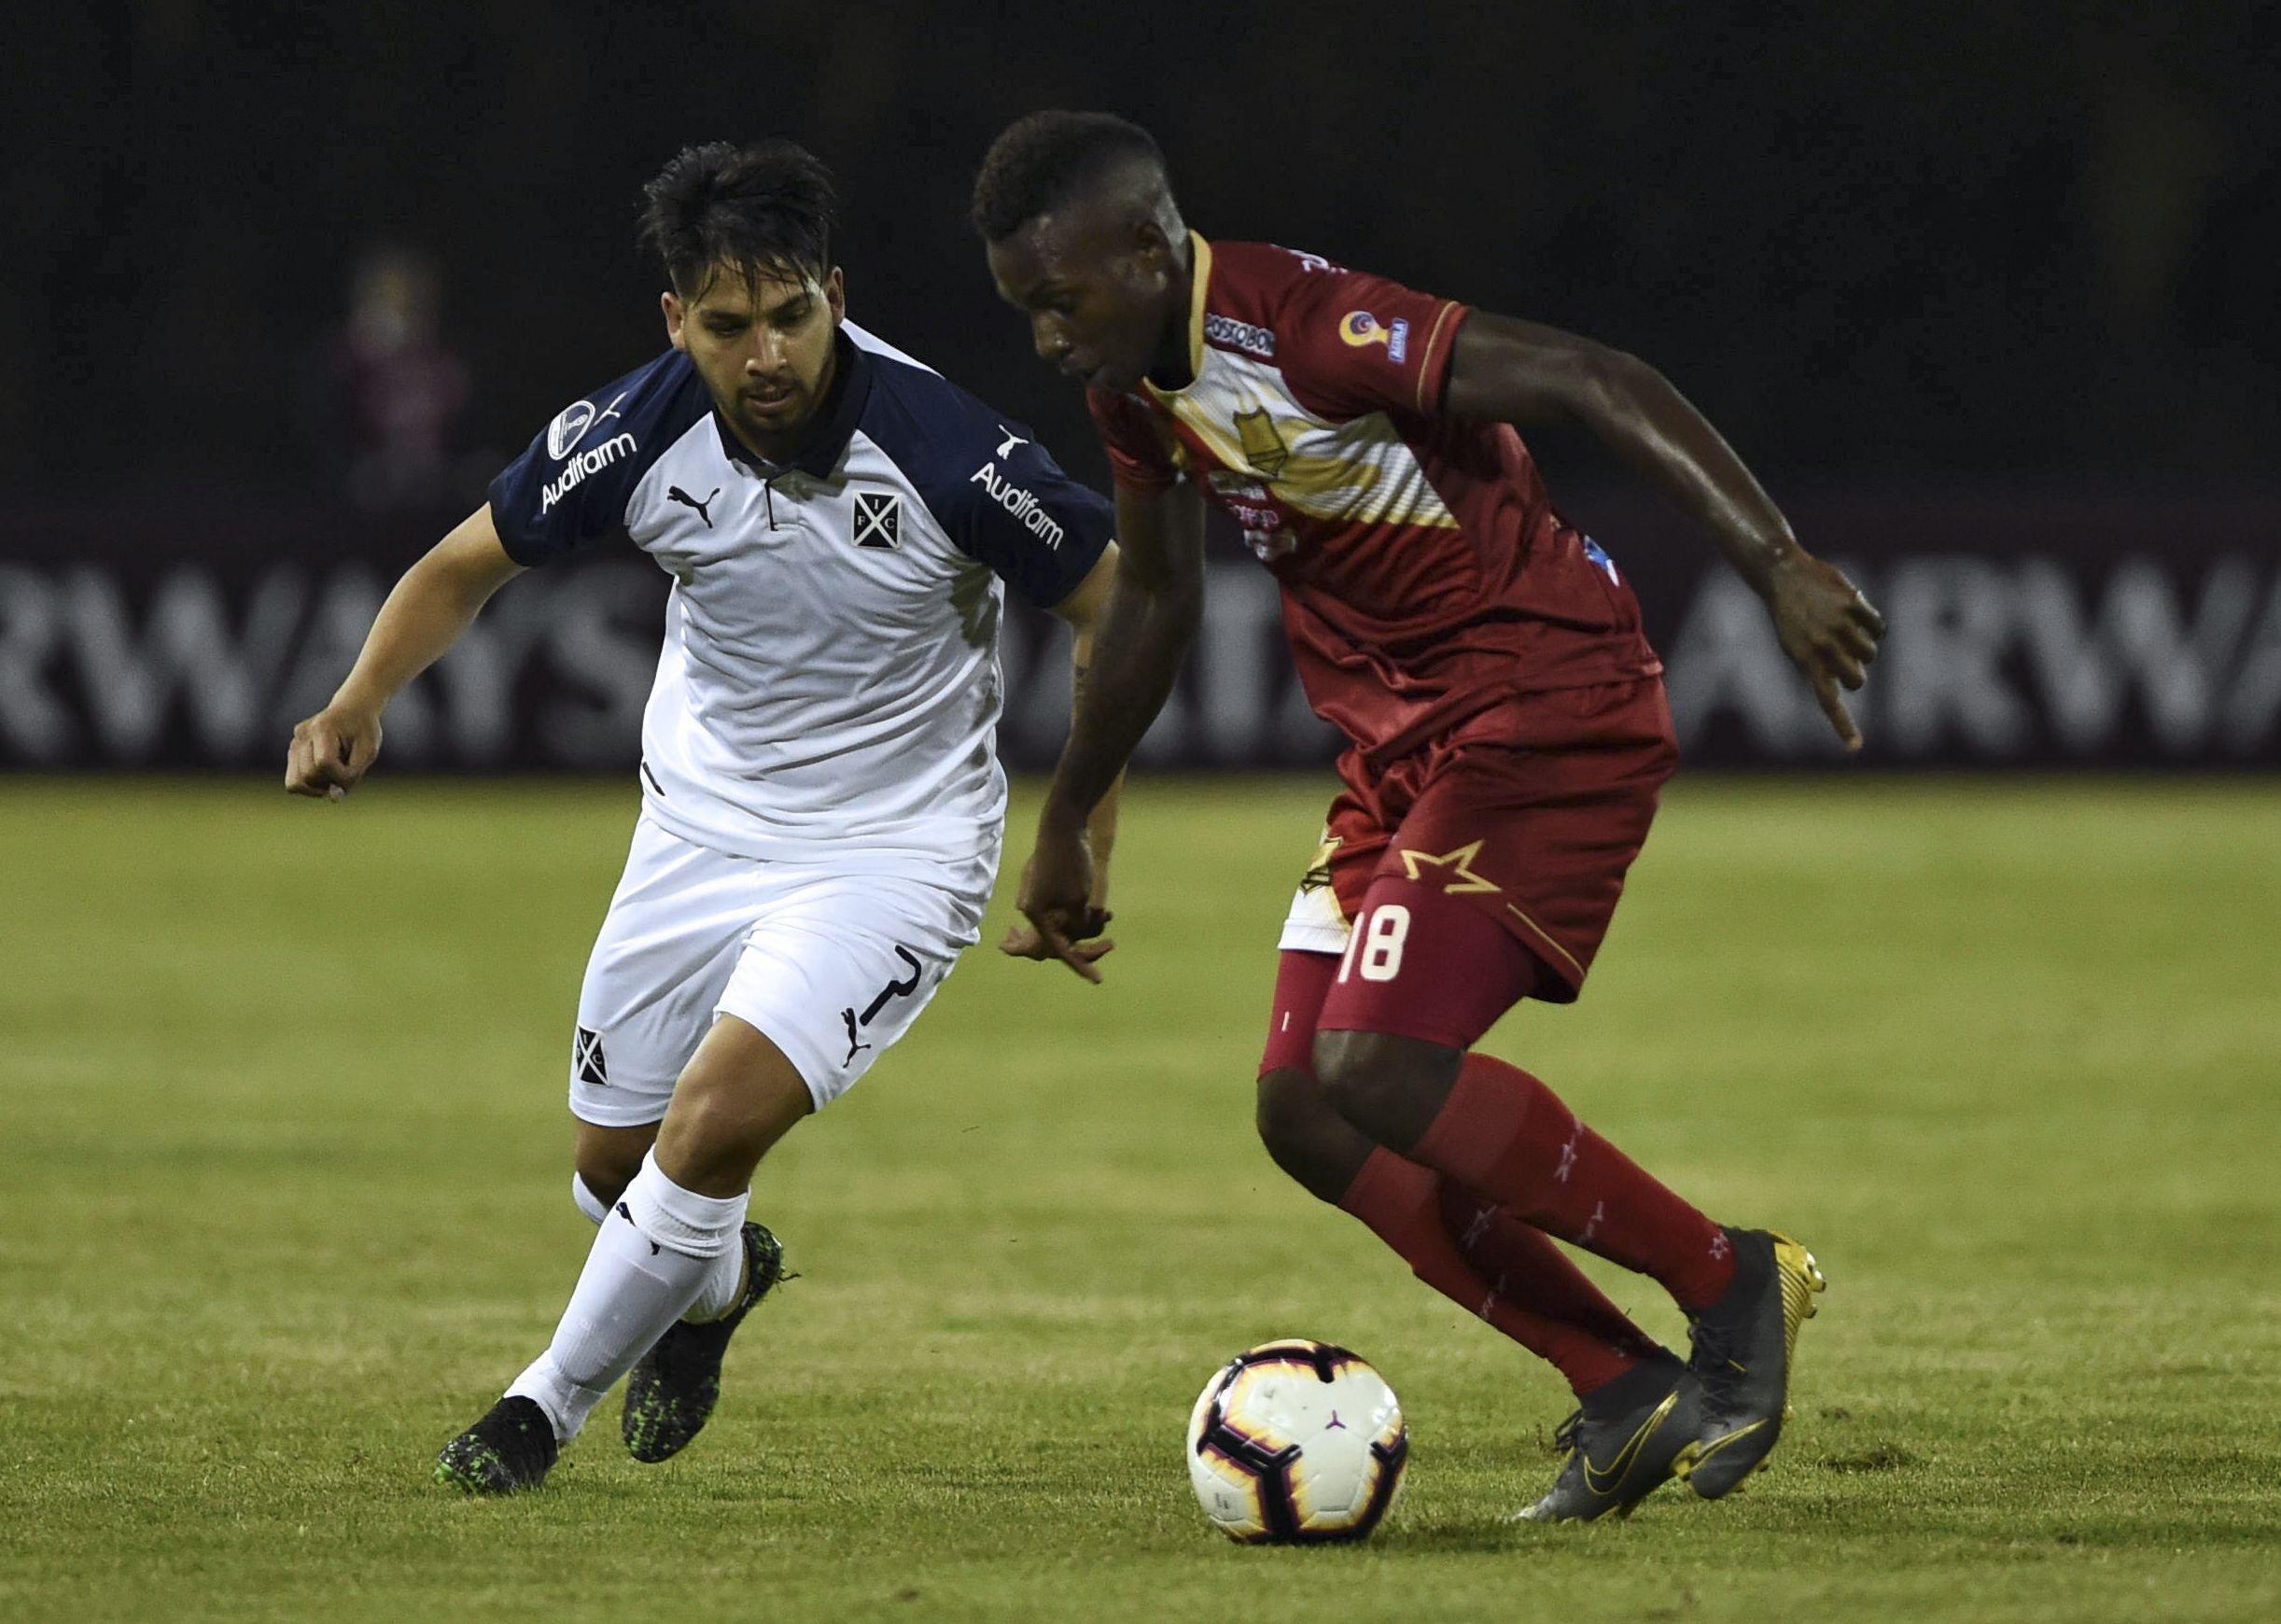 Martín Benítez pelea por la pelota